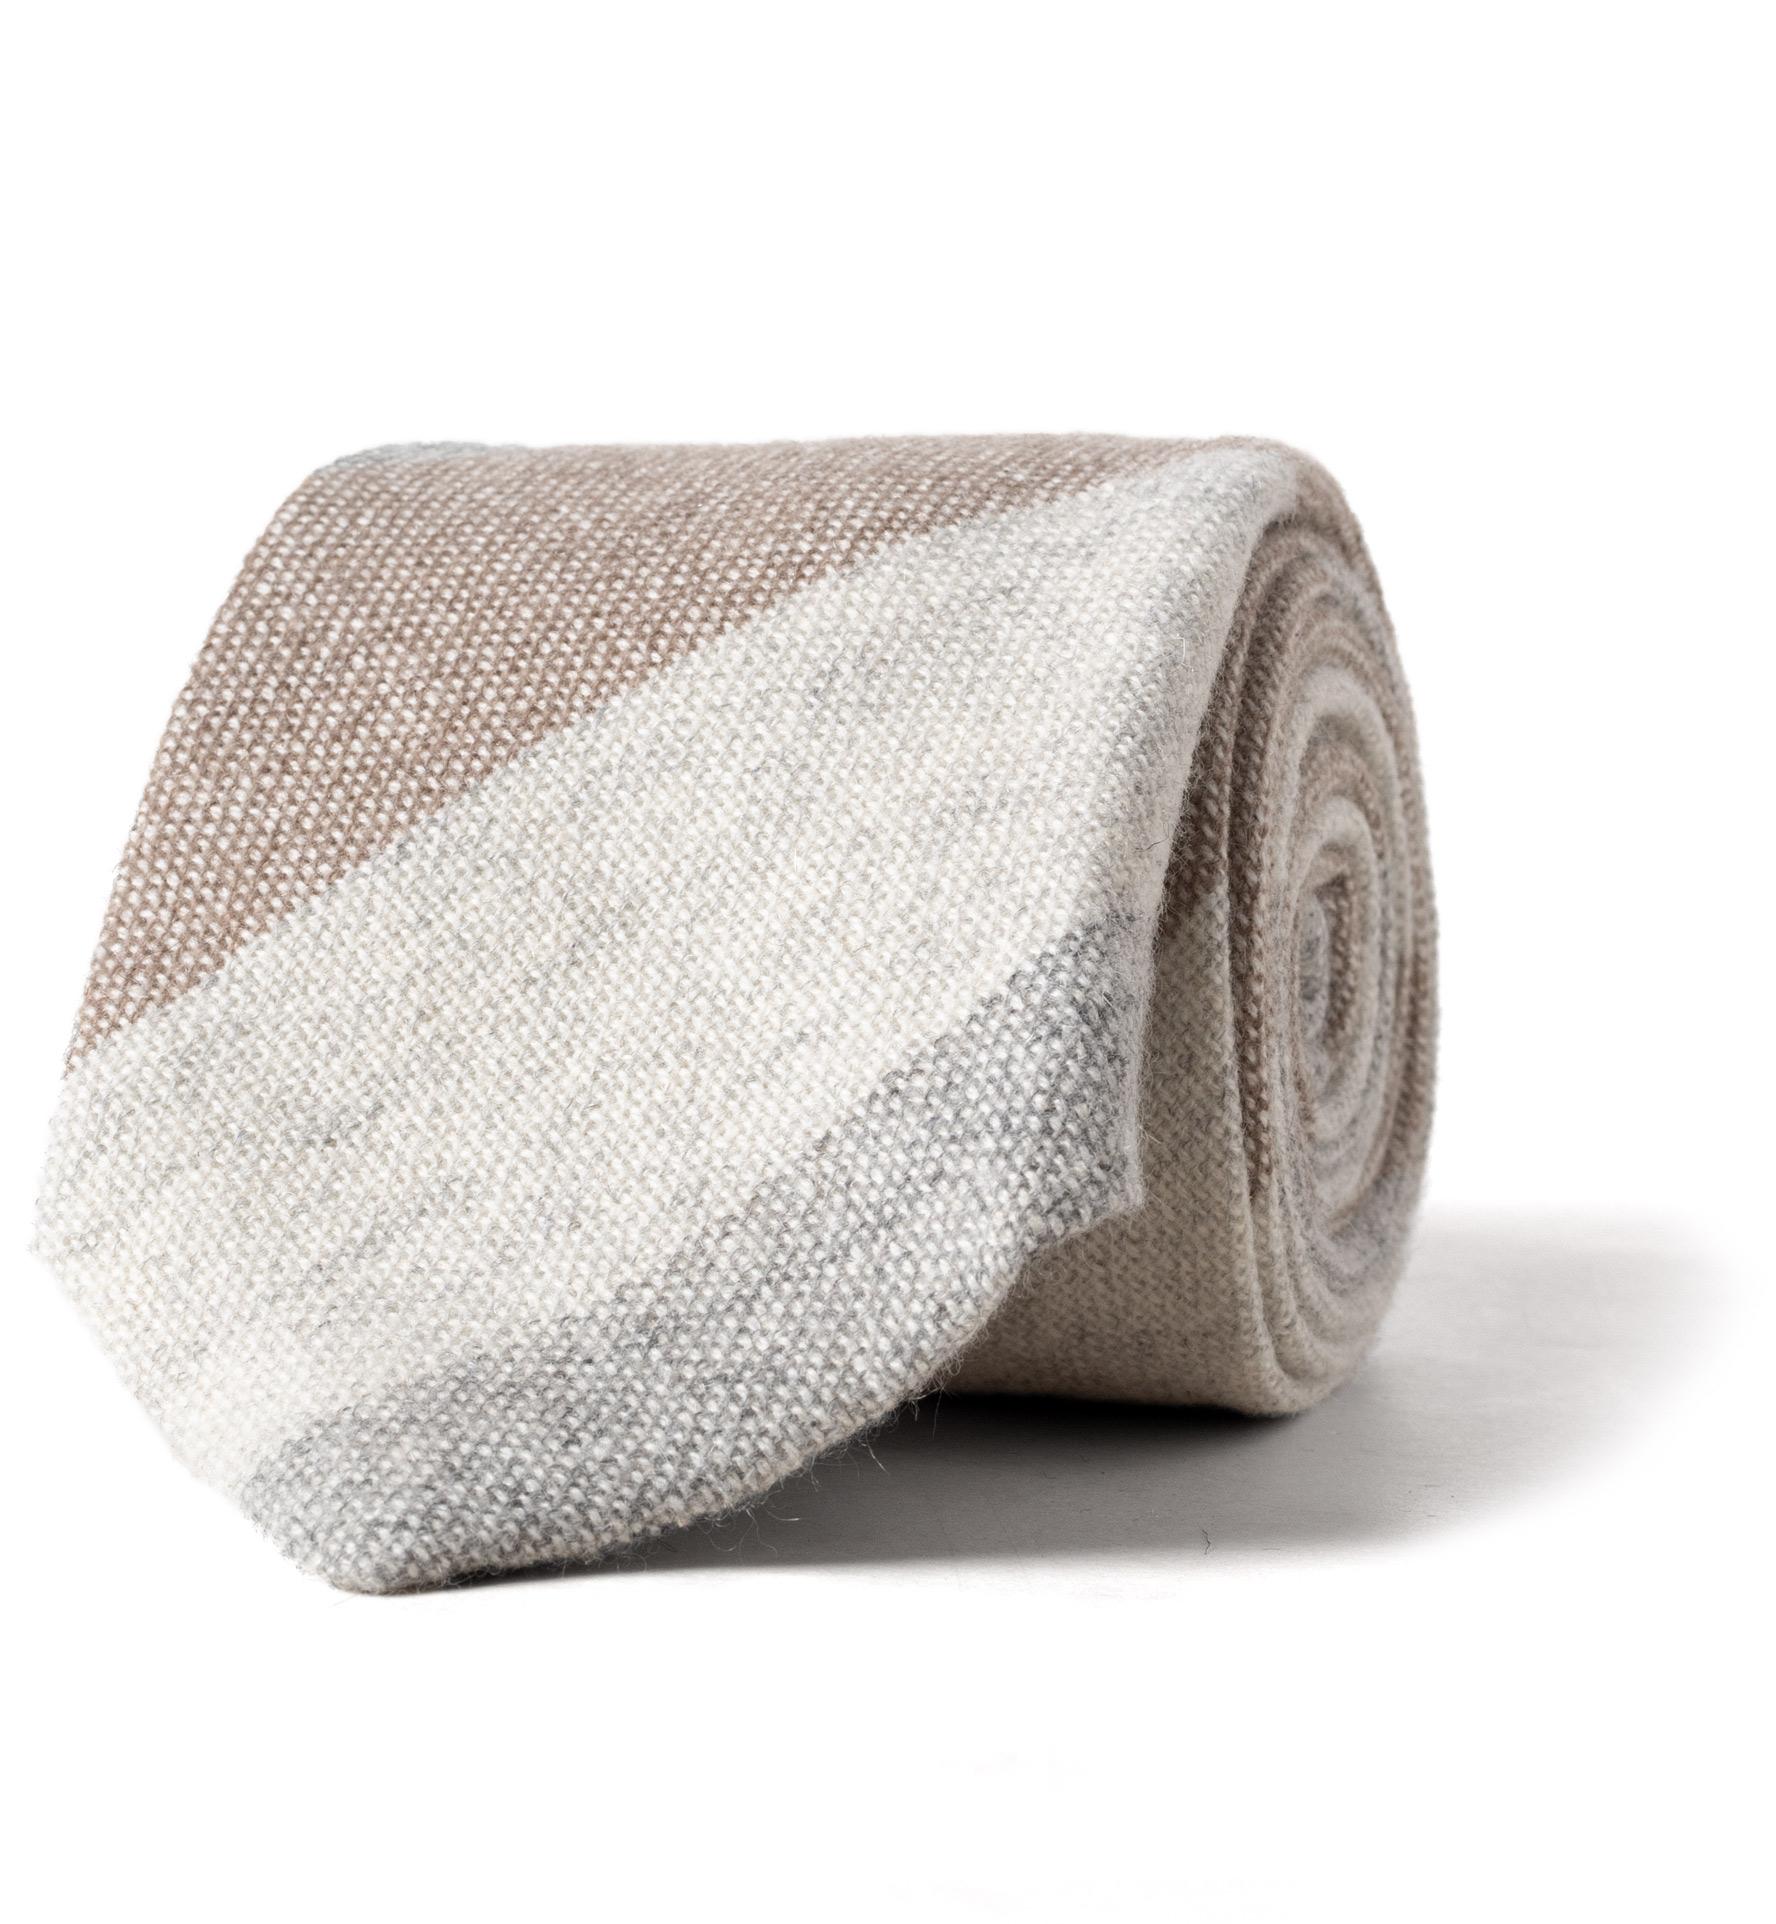 Zoom Image of Beige Wide Multi Stripe Cashmere Tie